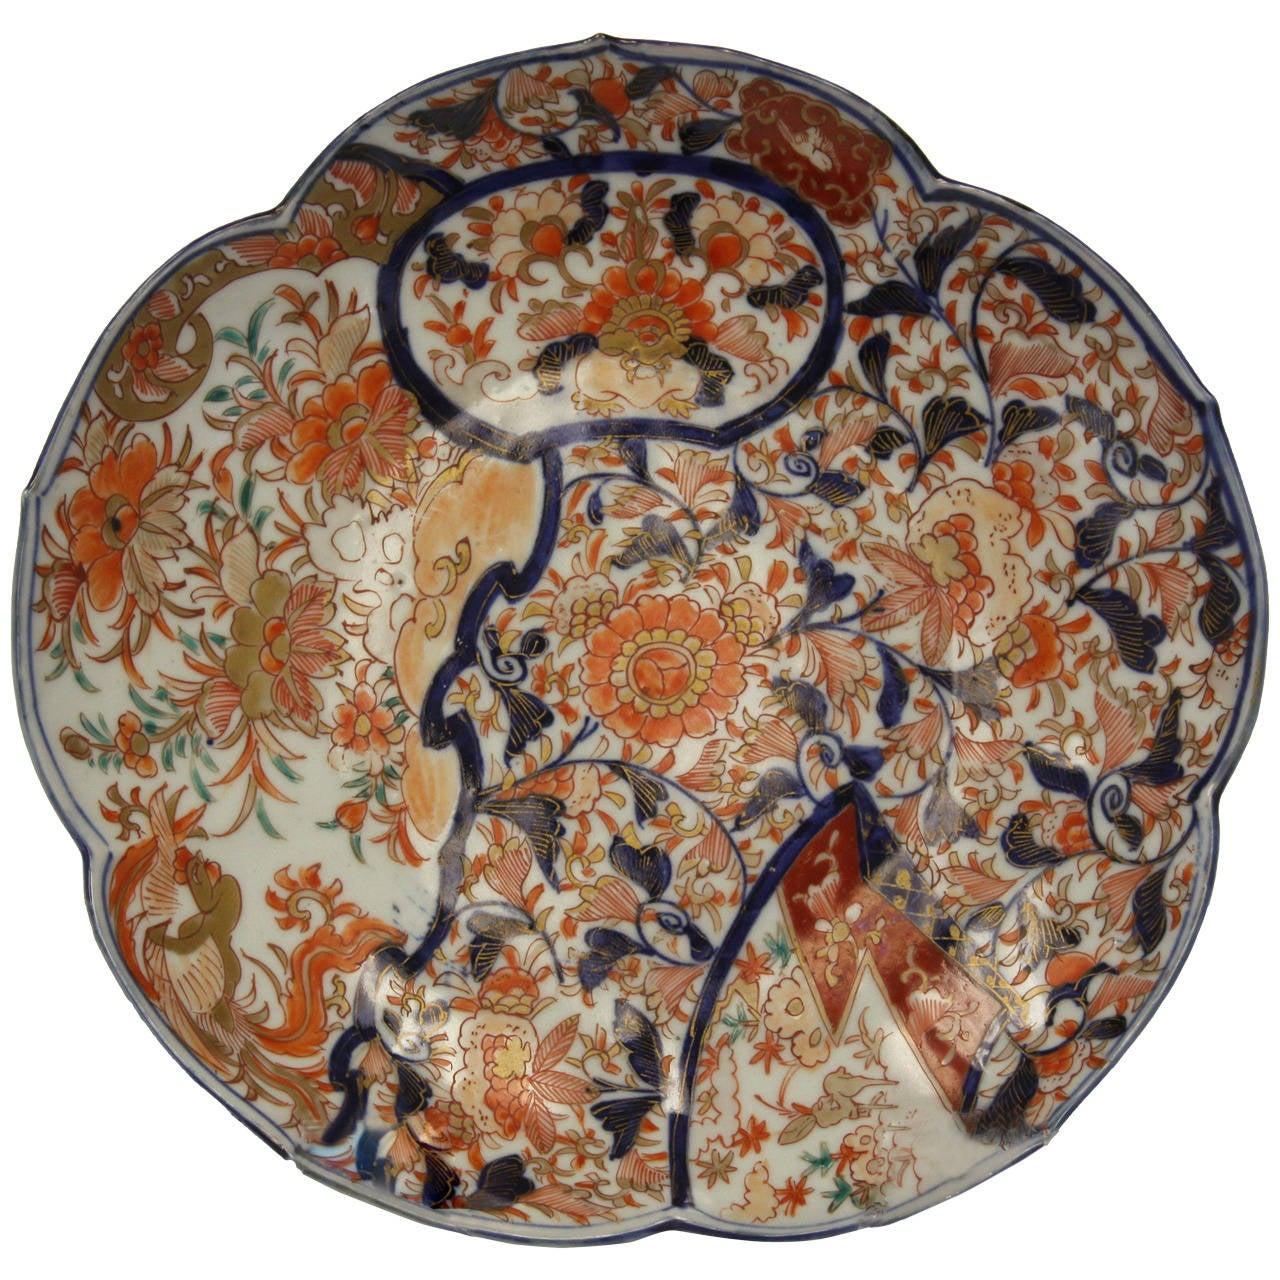 18th Century Imari Charger Bowl At 1stdibs